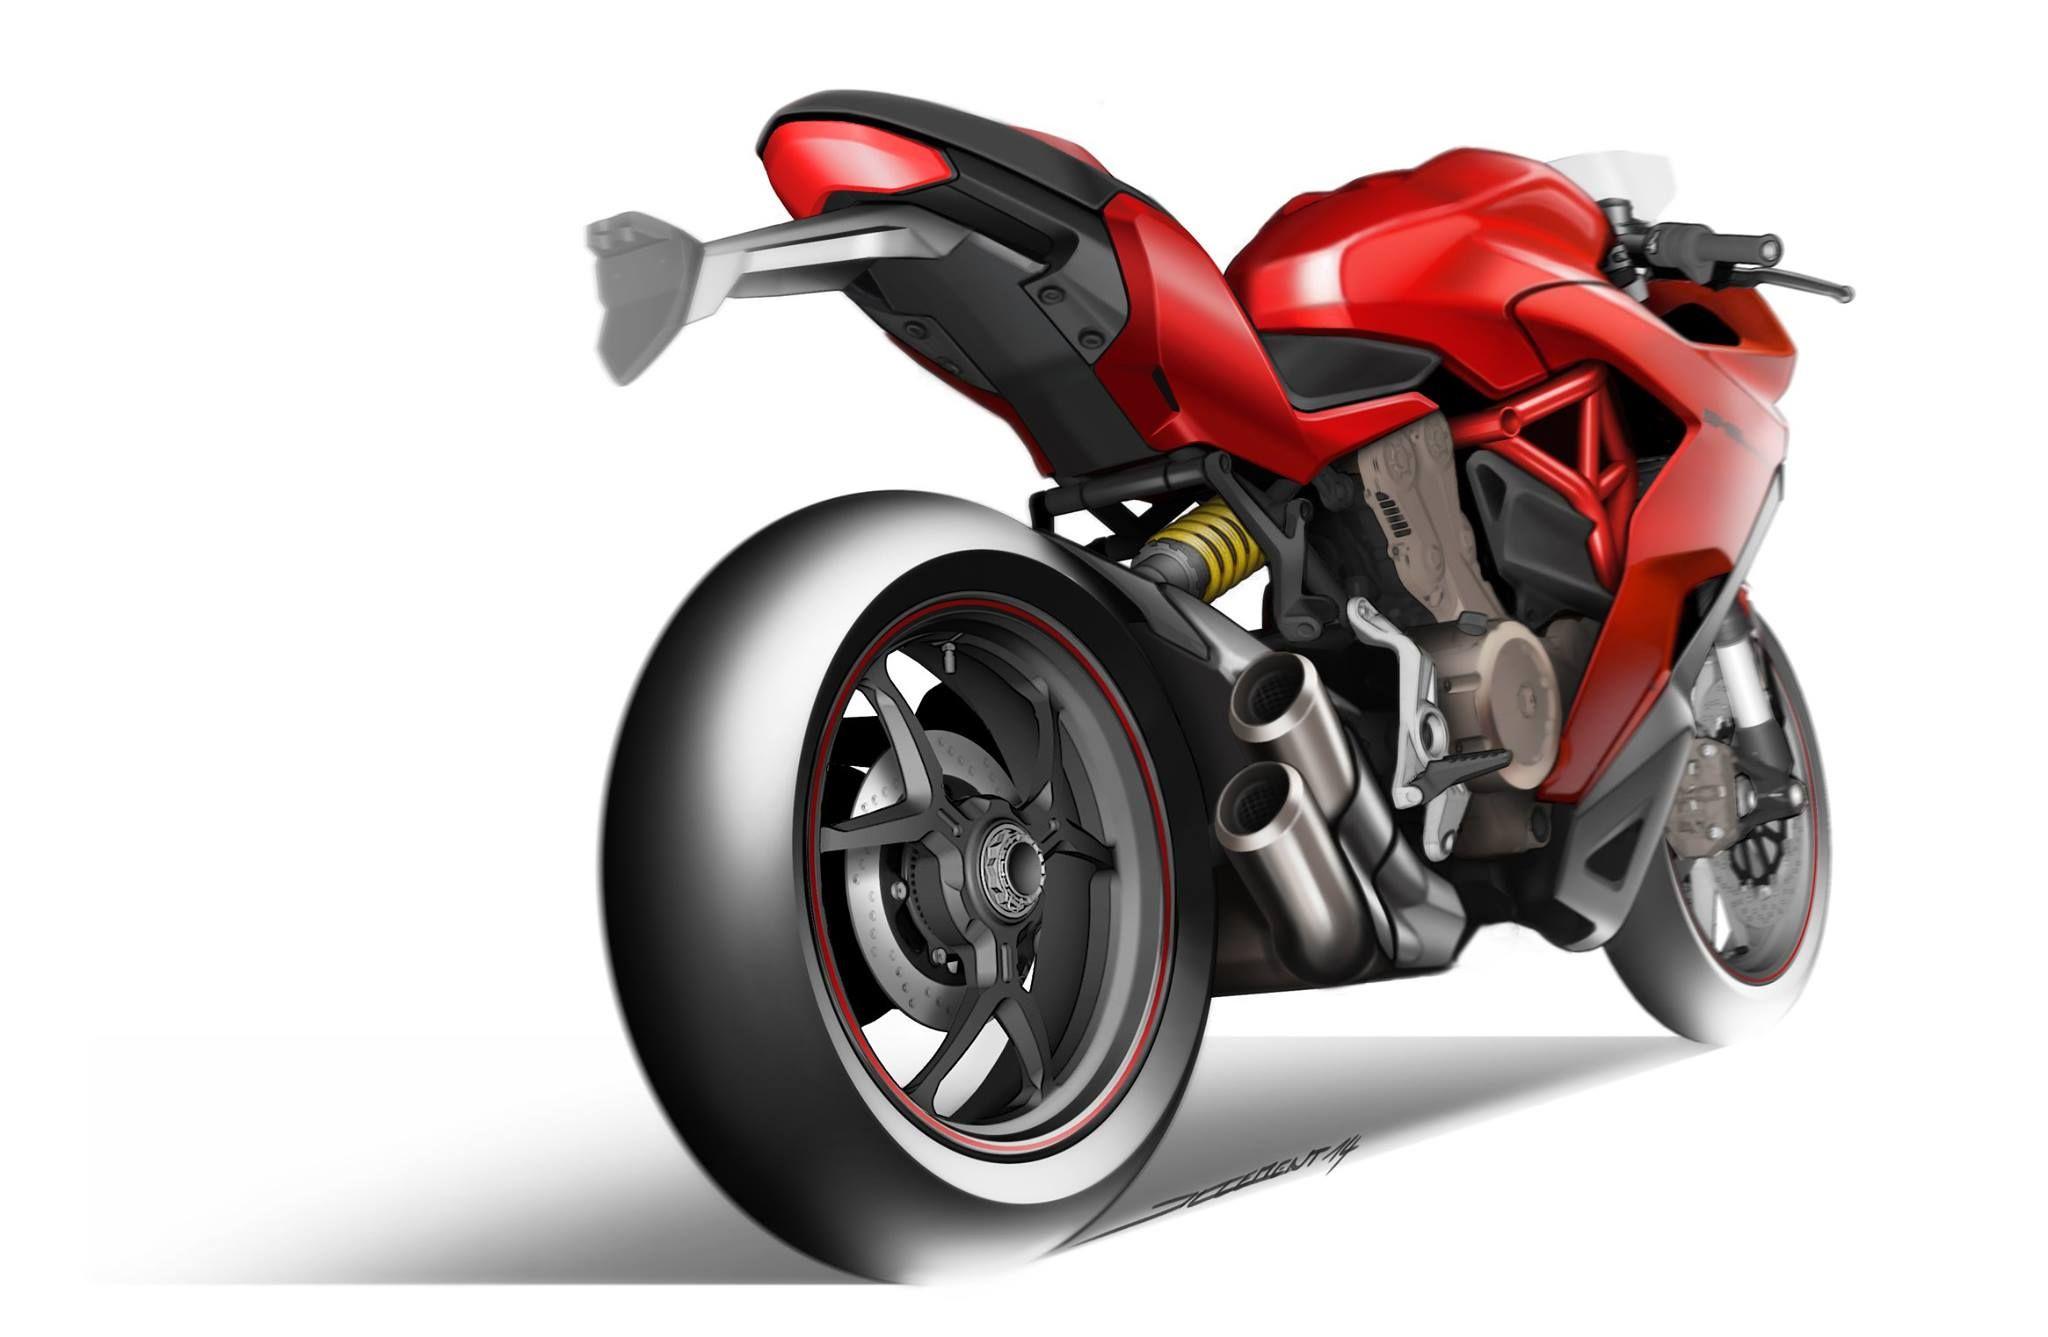 2014-ducati-monster-1200-concept-15 | moto | pinterest | ducati